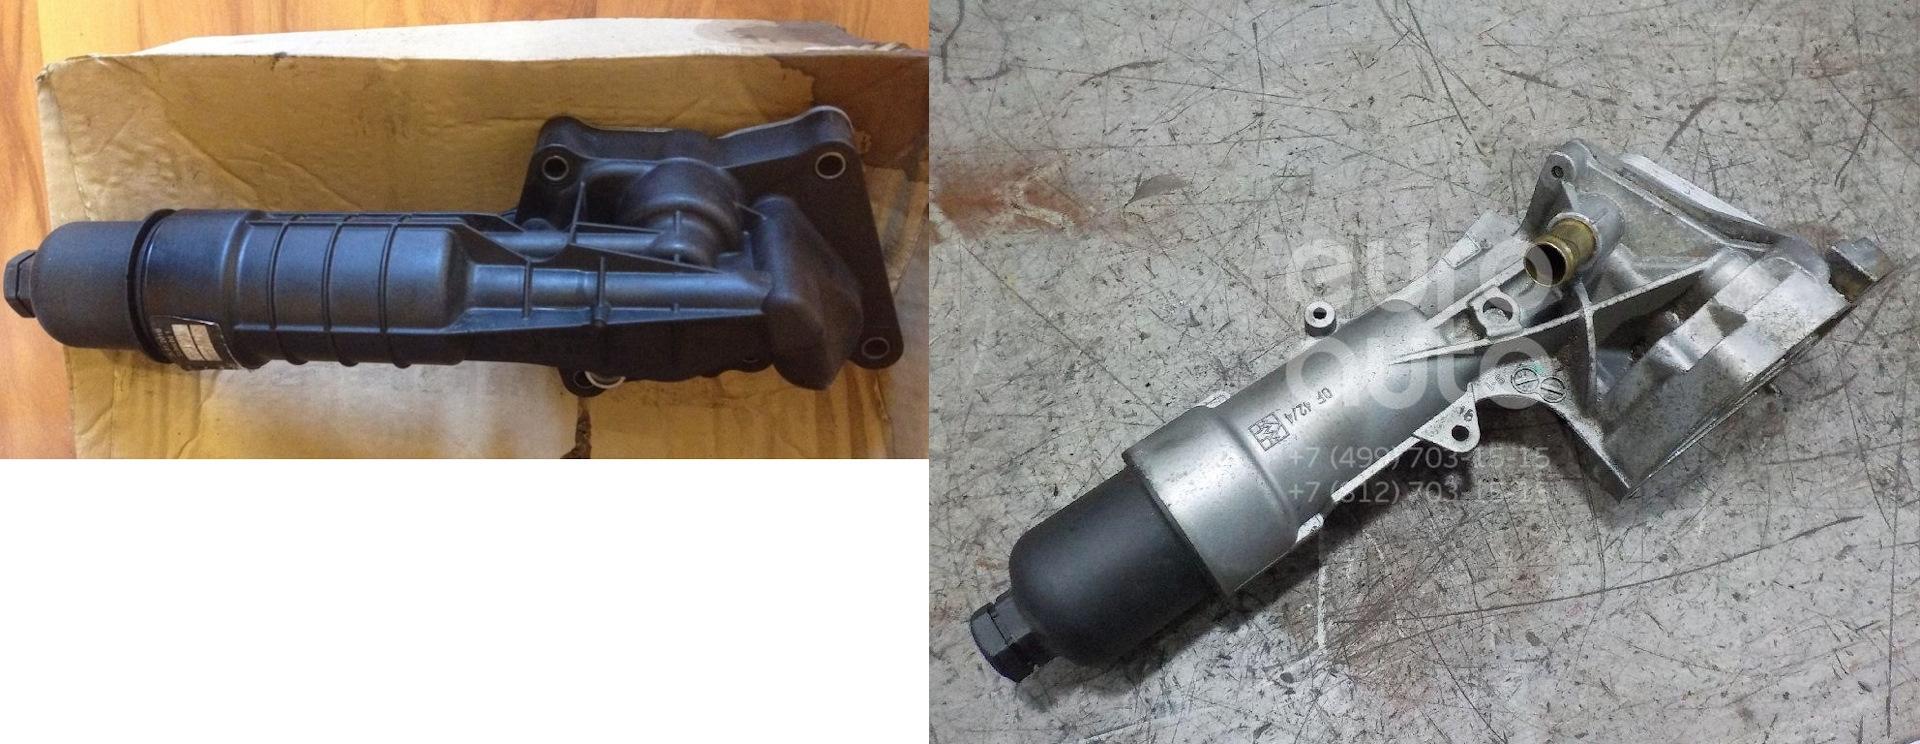 Течет теплообменник m271 Кожухотрубный конденсатор Alfa Laval CRF213-6-S 2P Королёв